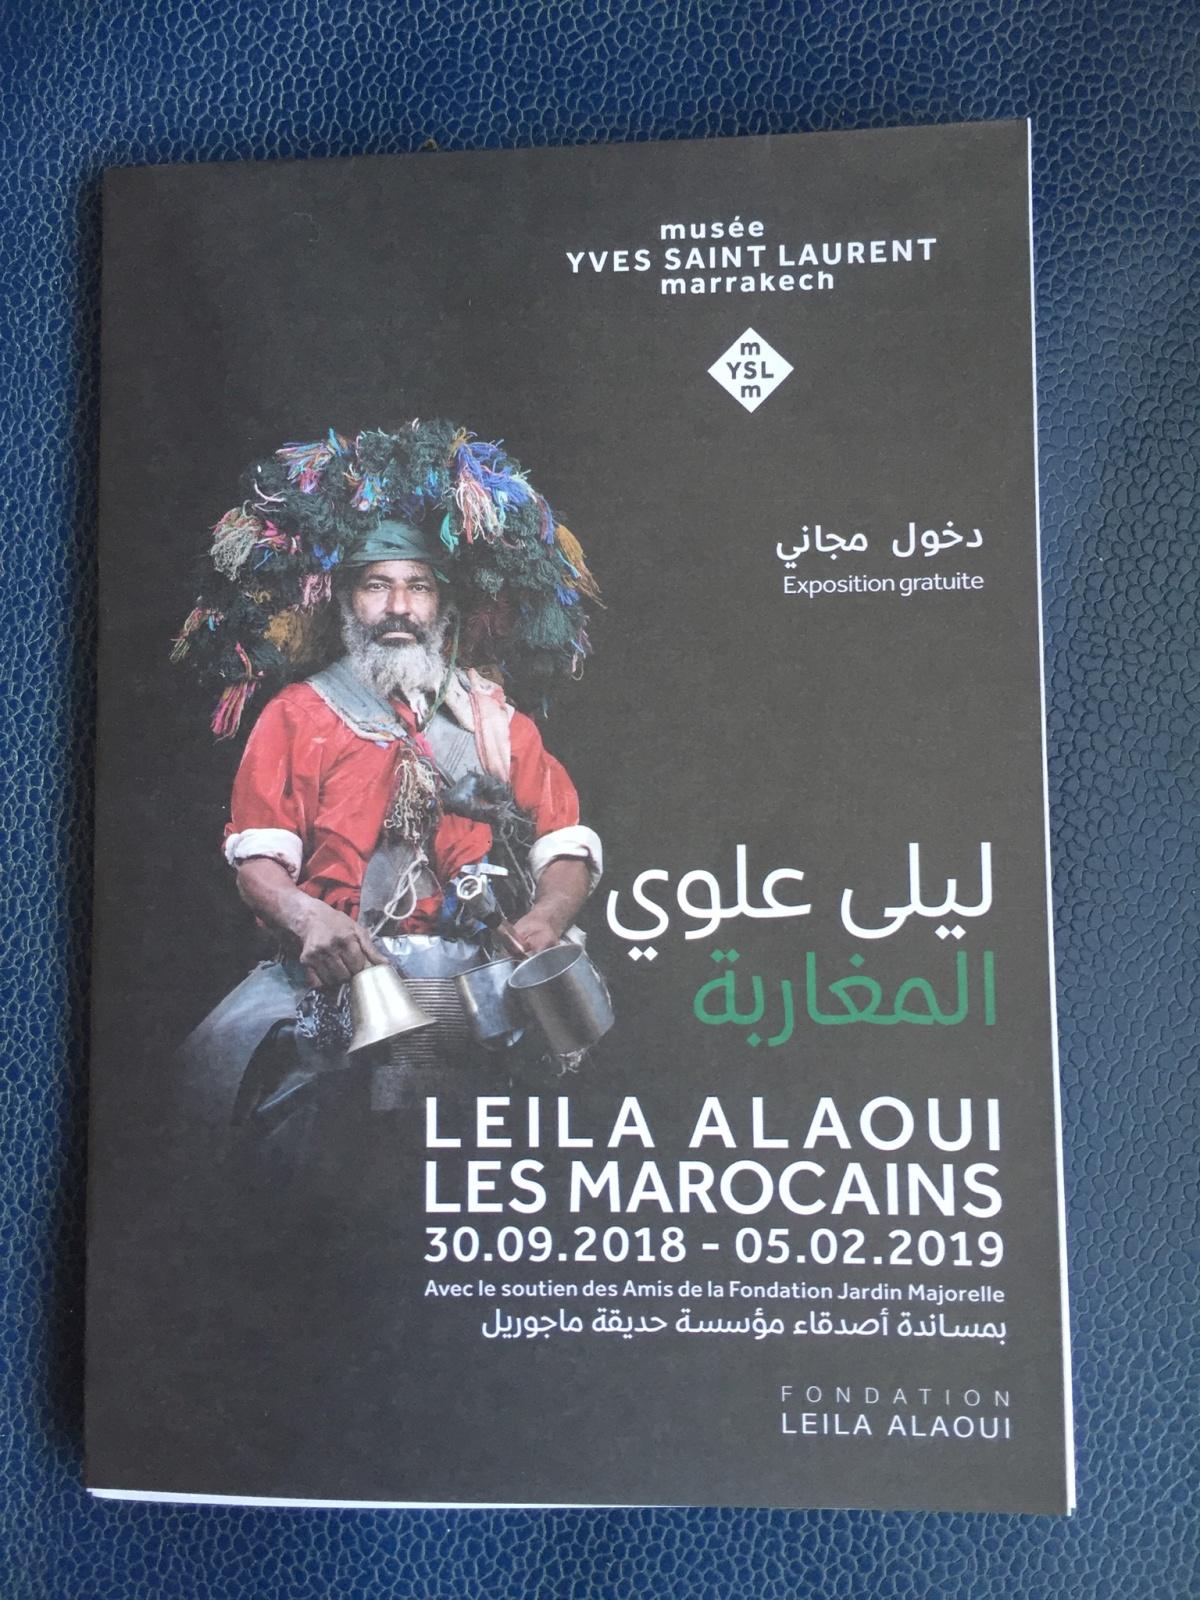 Musée Yves Saint Laurent-  Marrakech: -LeilaAlaoui-